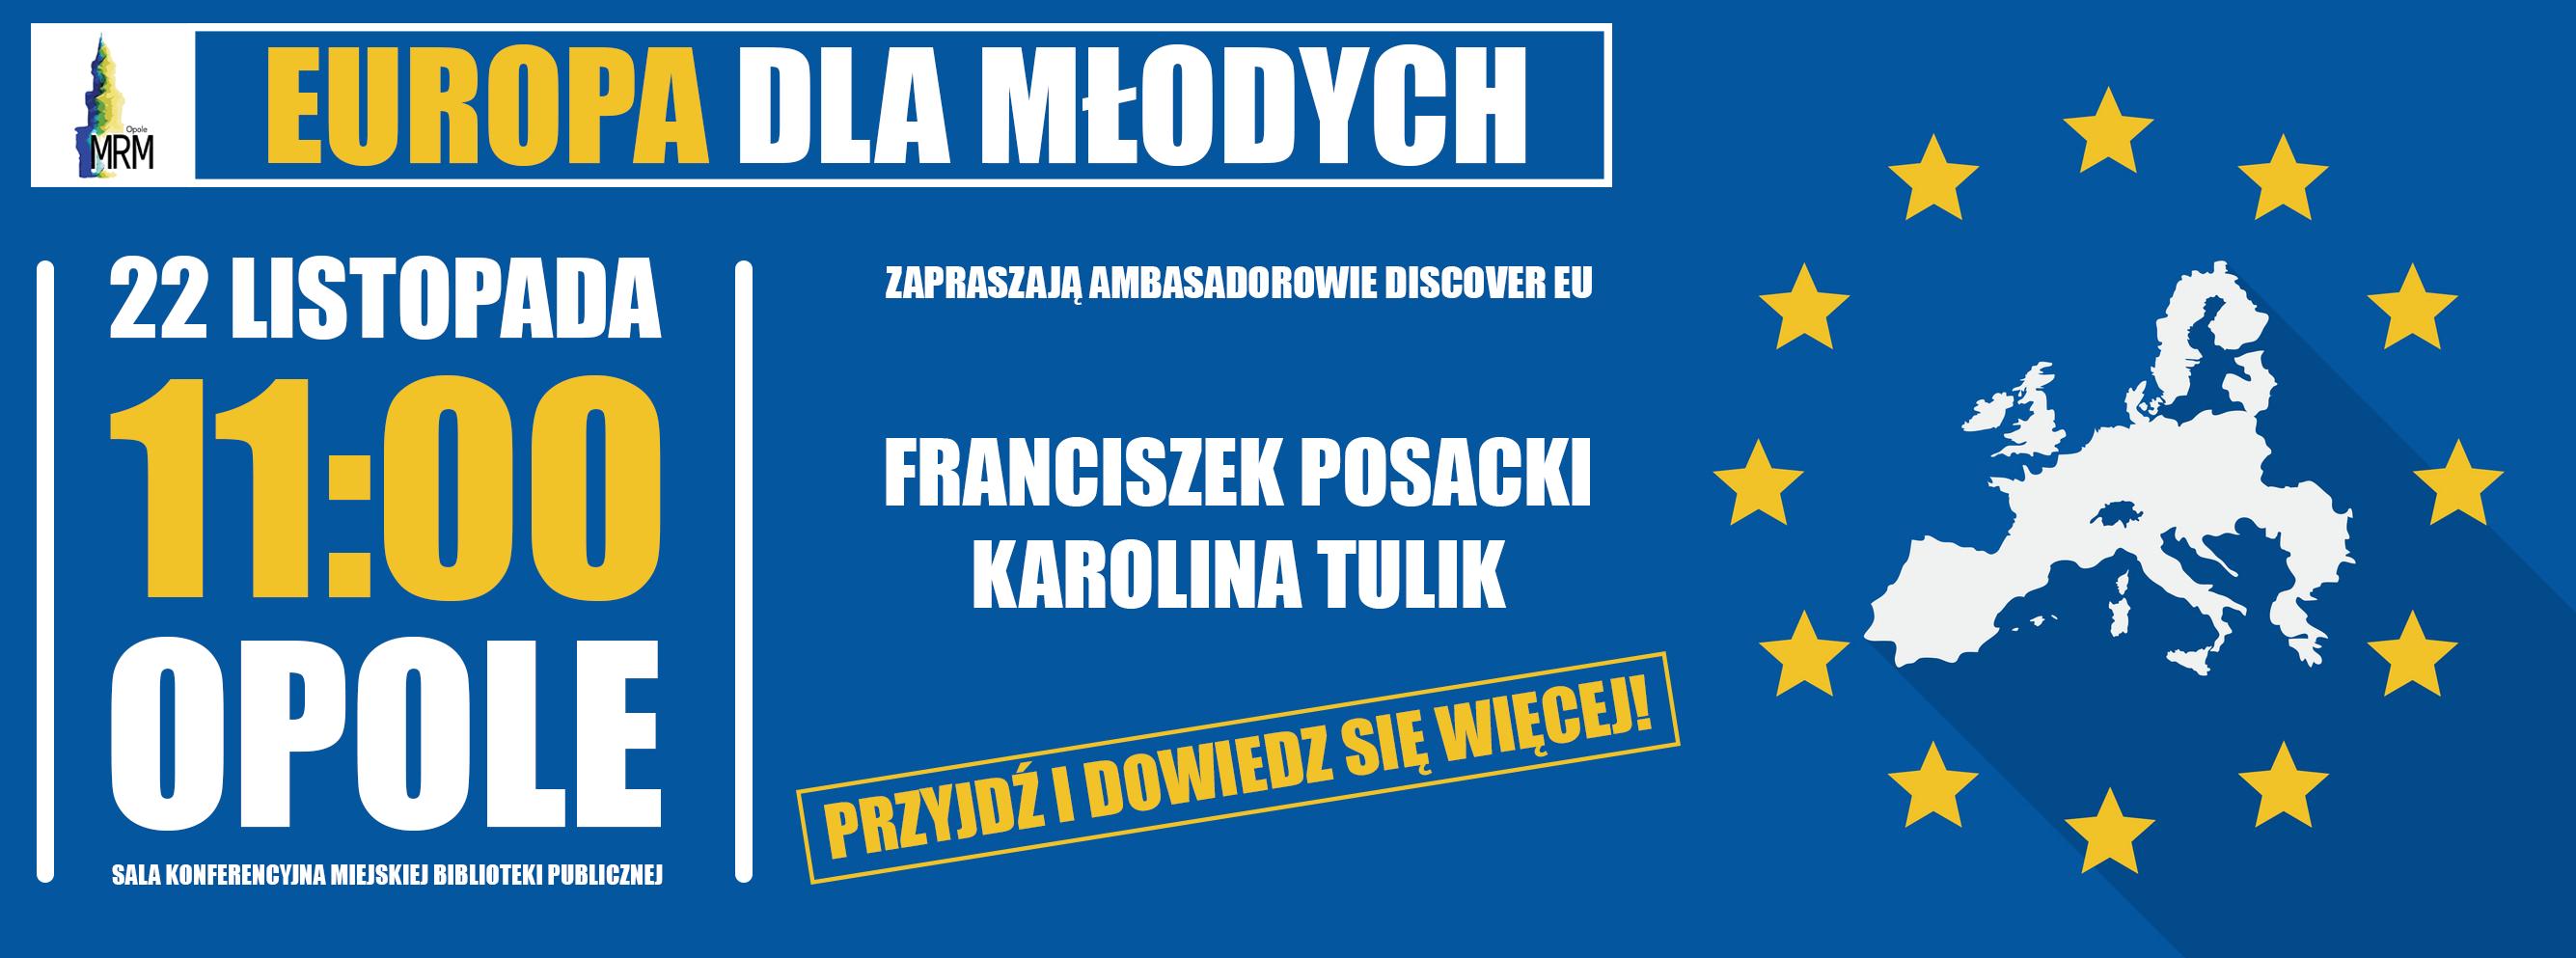 Europa dla Młodych / debata